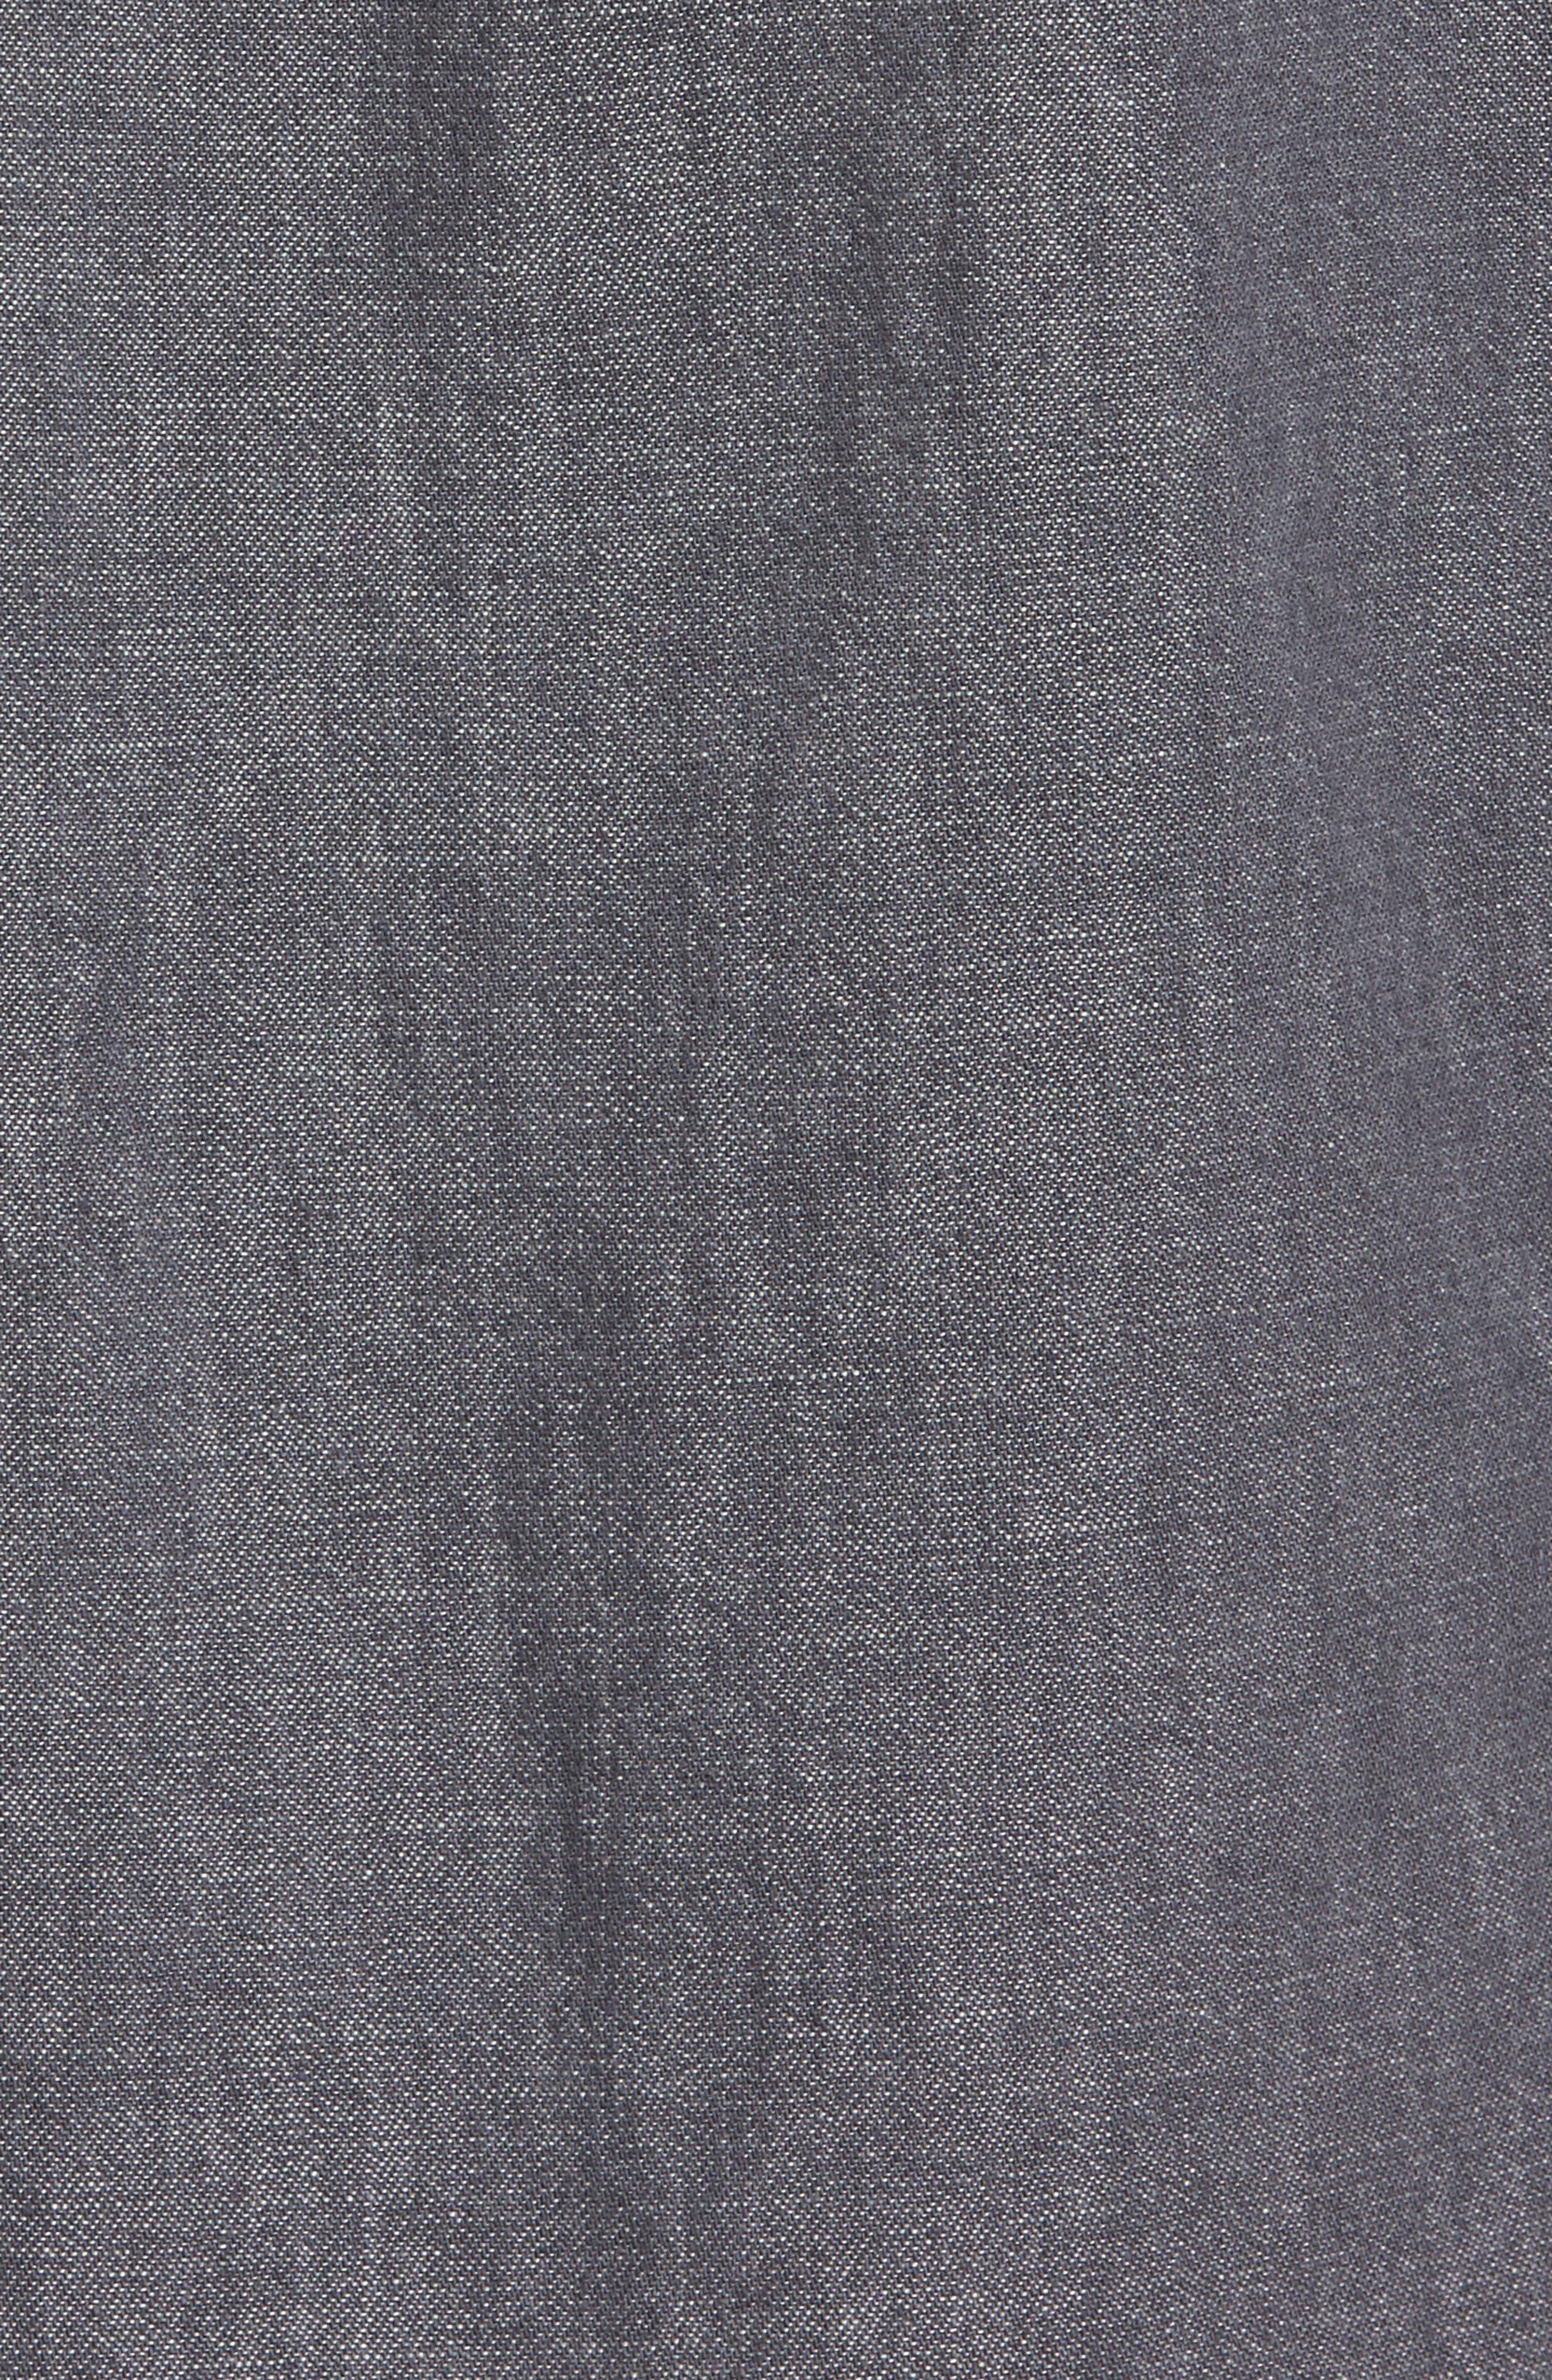 3301 Craser Denim Shirt,                             Alternate thumbnail 5, color,                             Medium Aged Restored